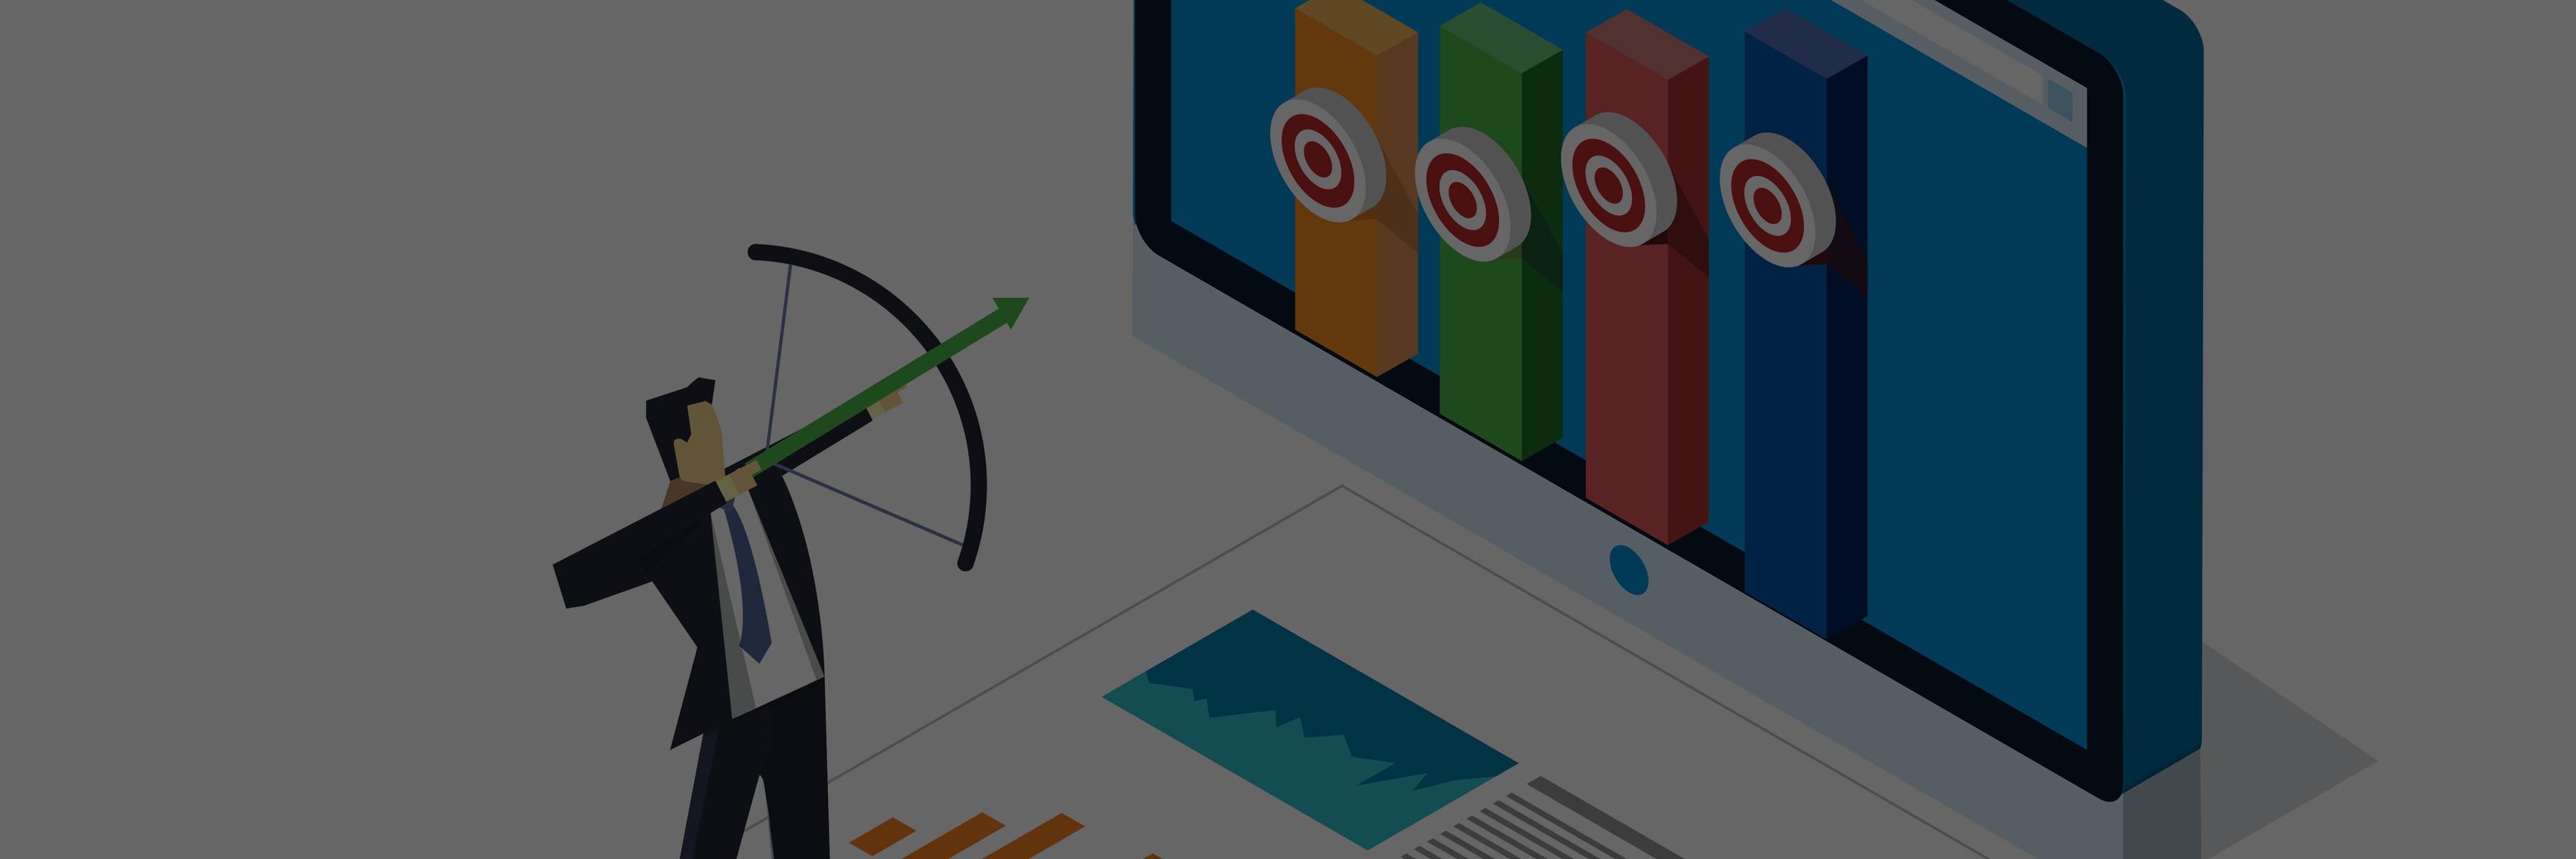 naem-webinar-2018-how-science-based-targets-drive-impact-for-companies--min